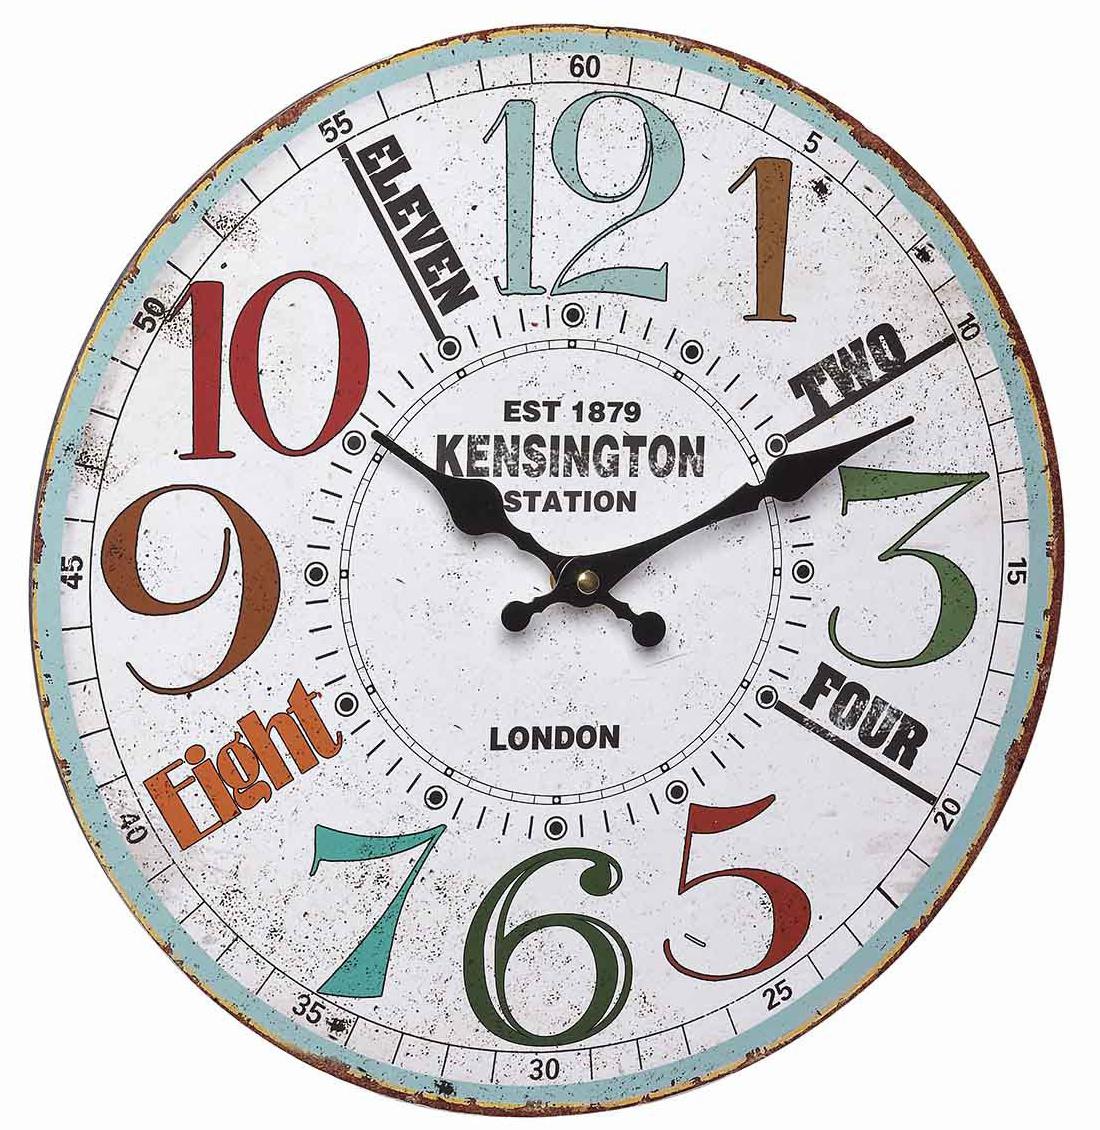 TFA Dostmann Vintage hodiny, Kensington TFA 60.3045.11